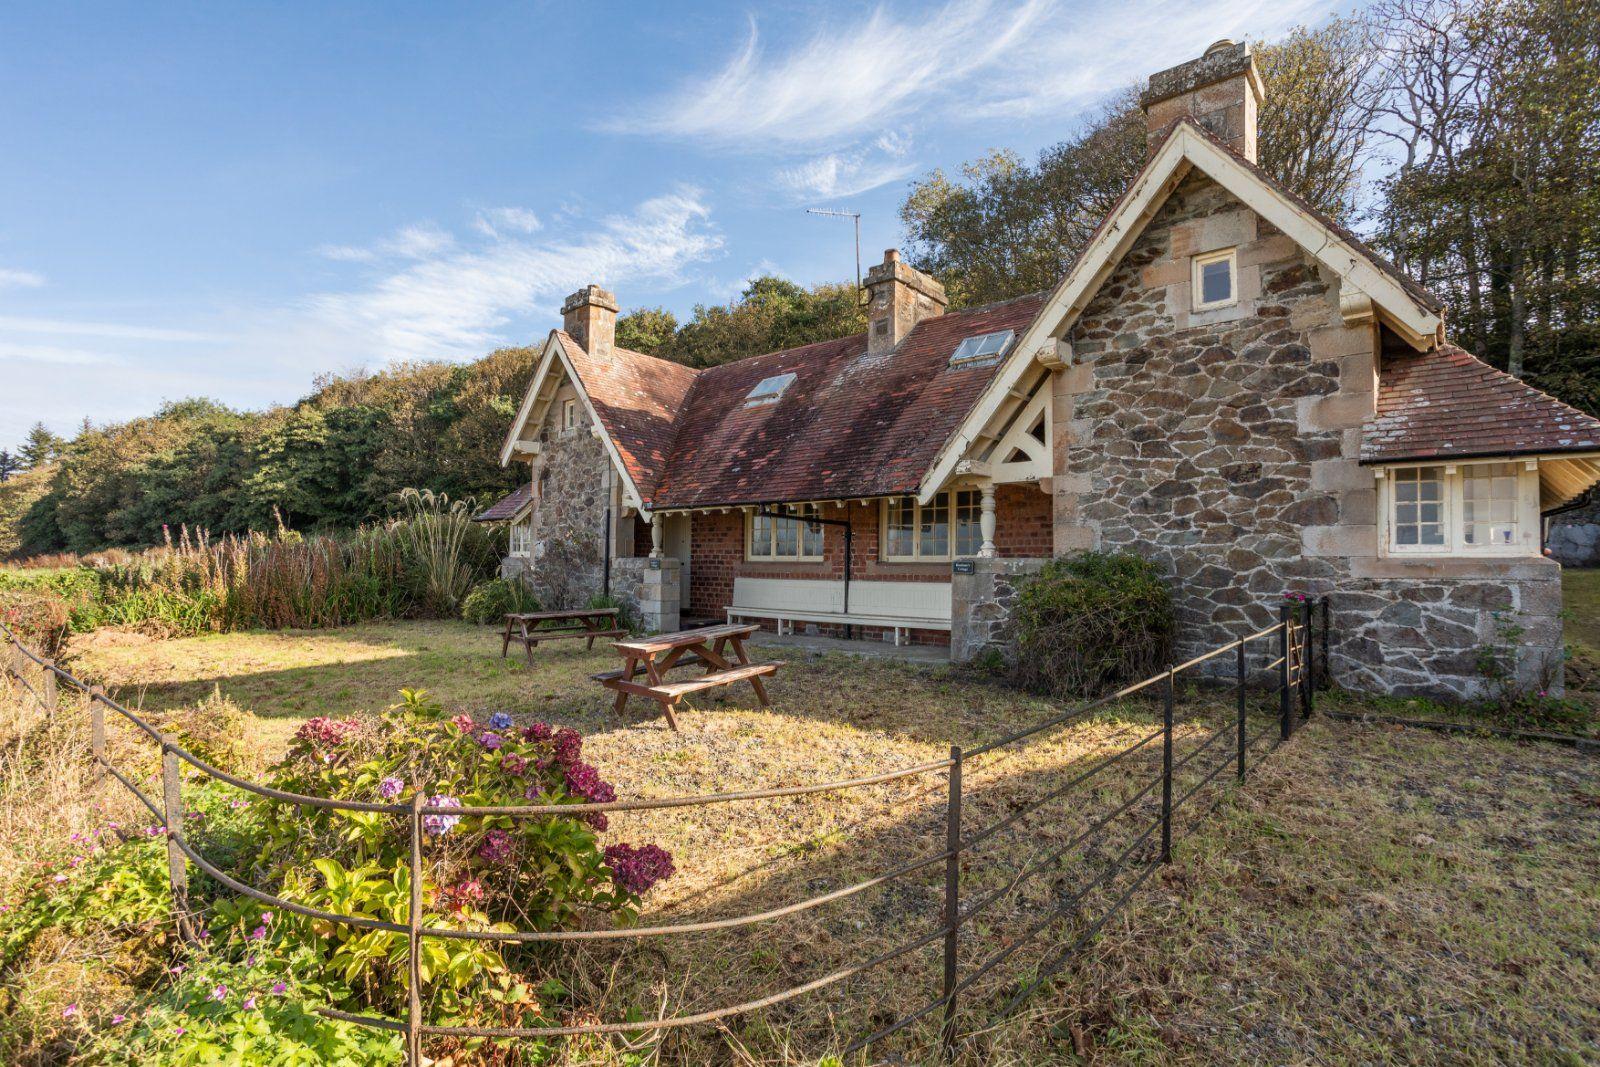 Property photo 1 of 9. Boatman's Cottage